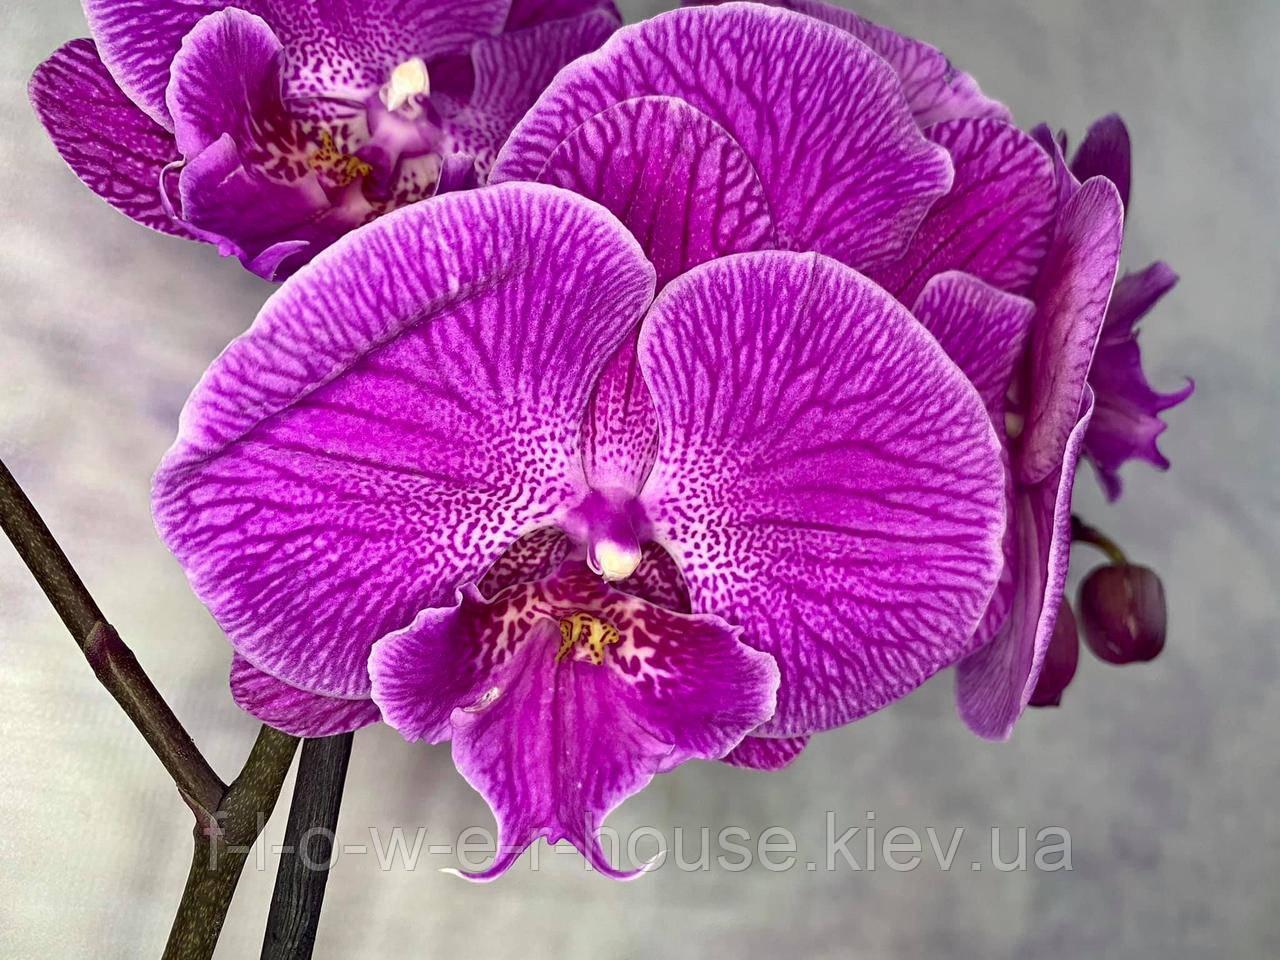 Орхидея Мега крутый биг лип